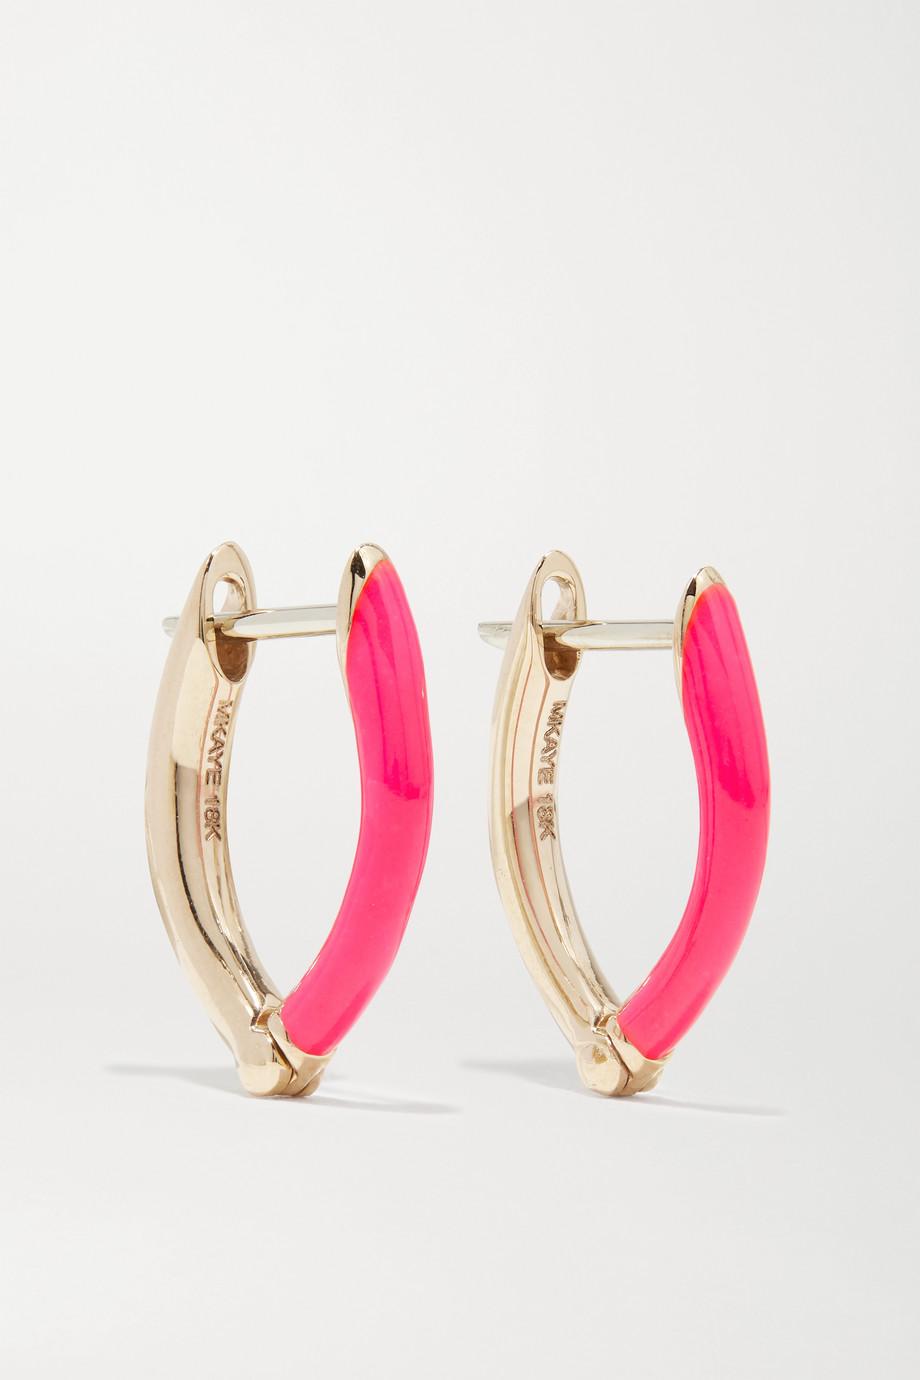 Melissa Kaye Cristina small 18-karat rose gold and enamel earrings